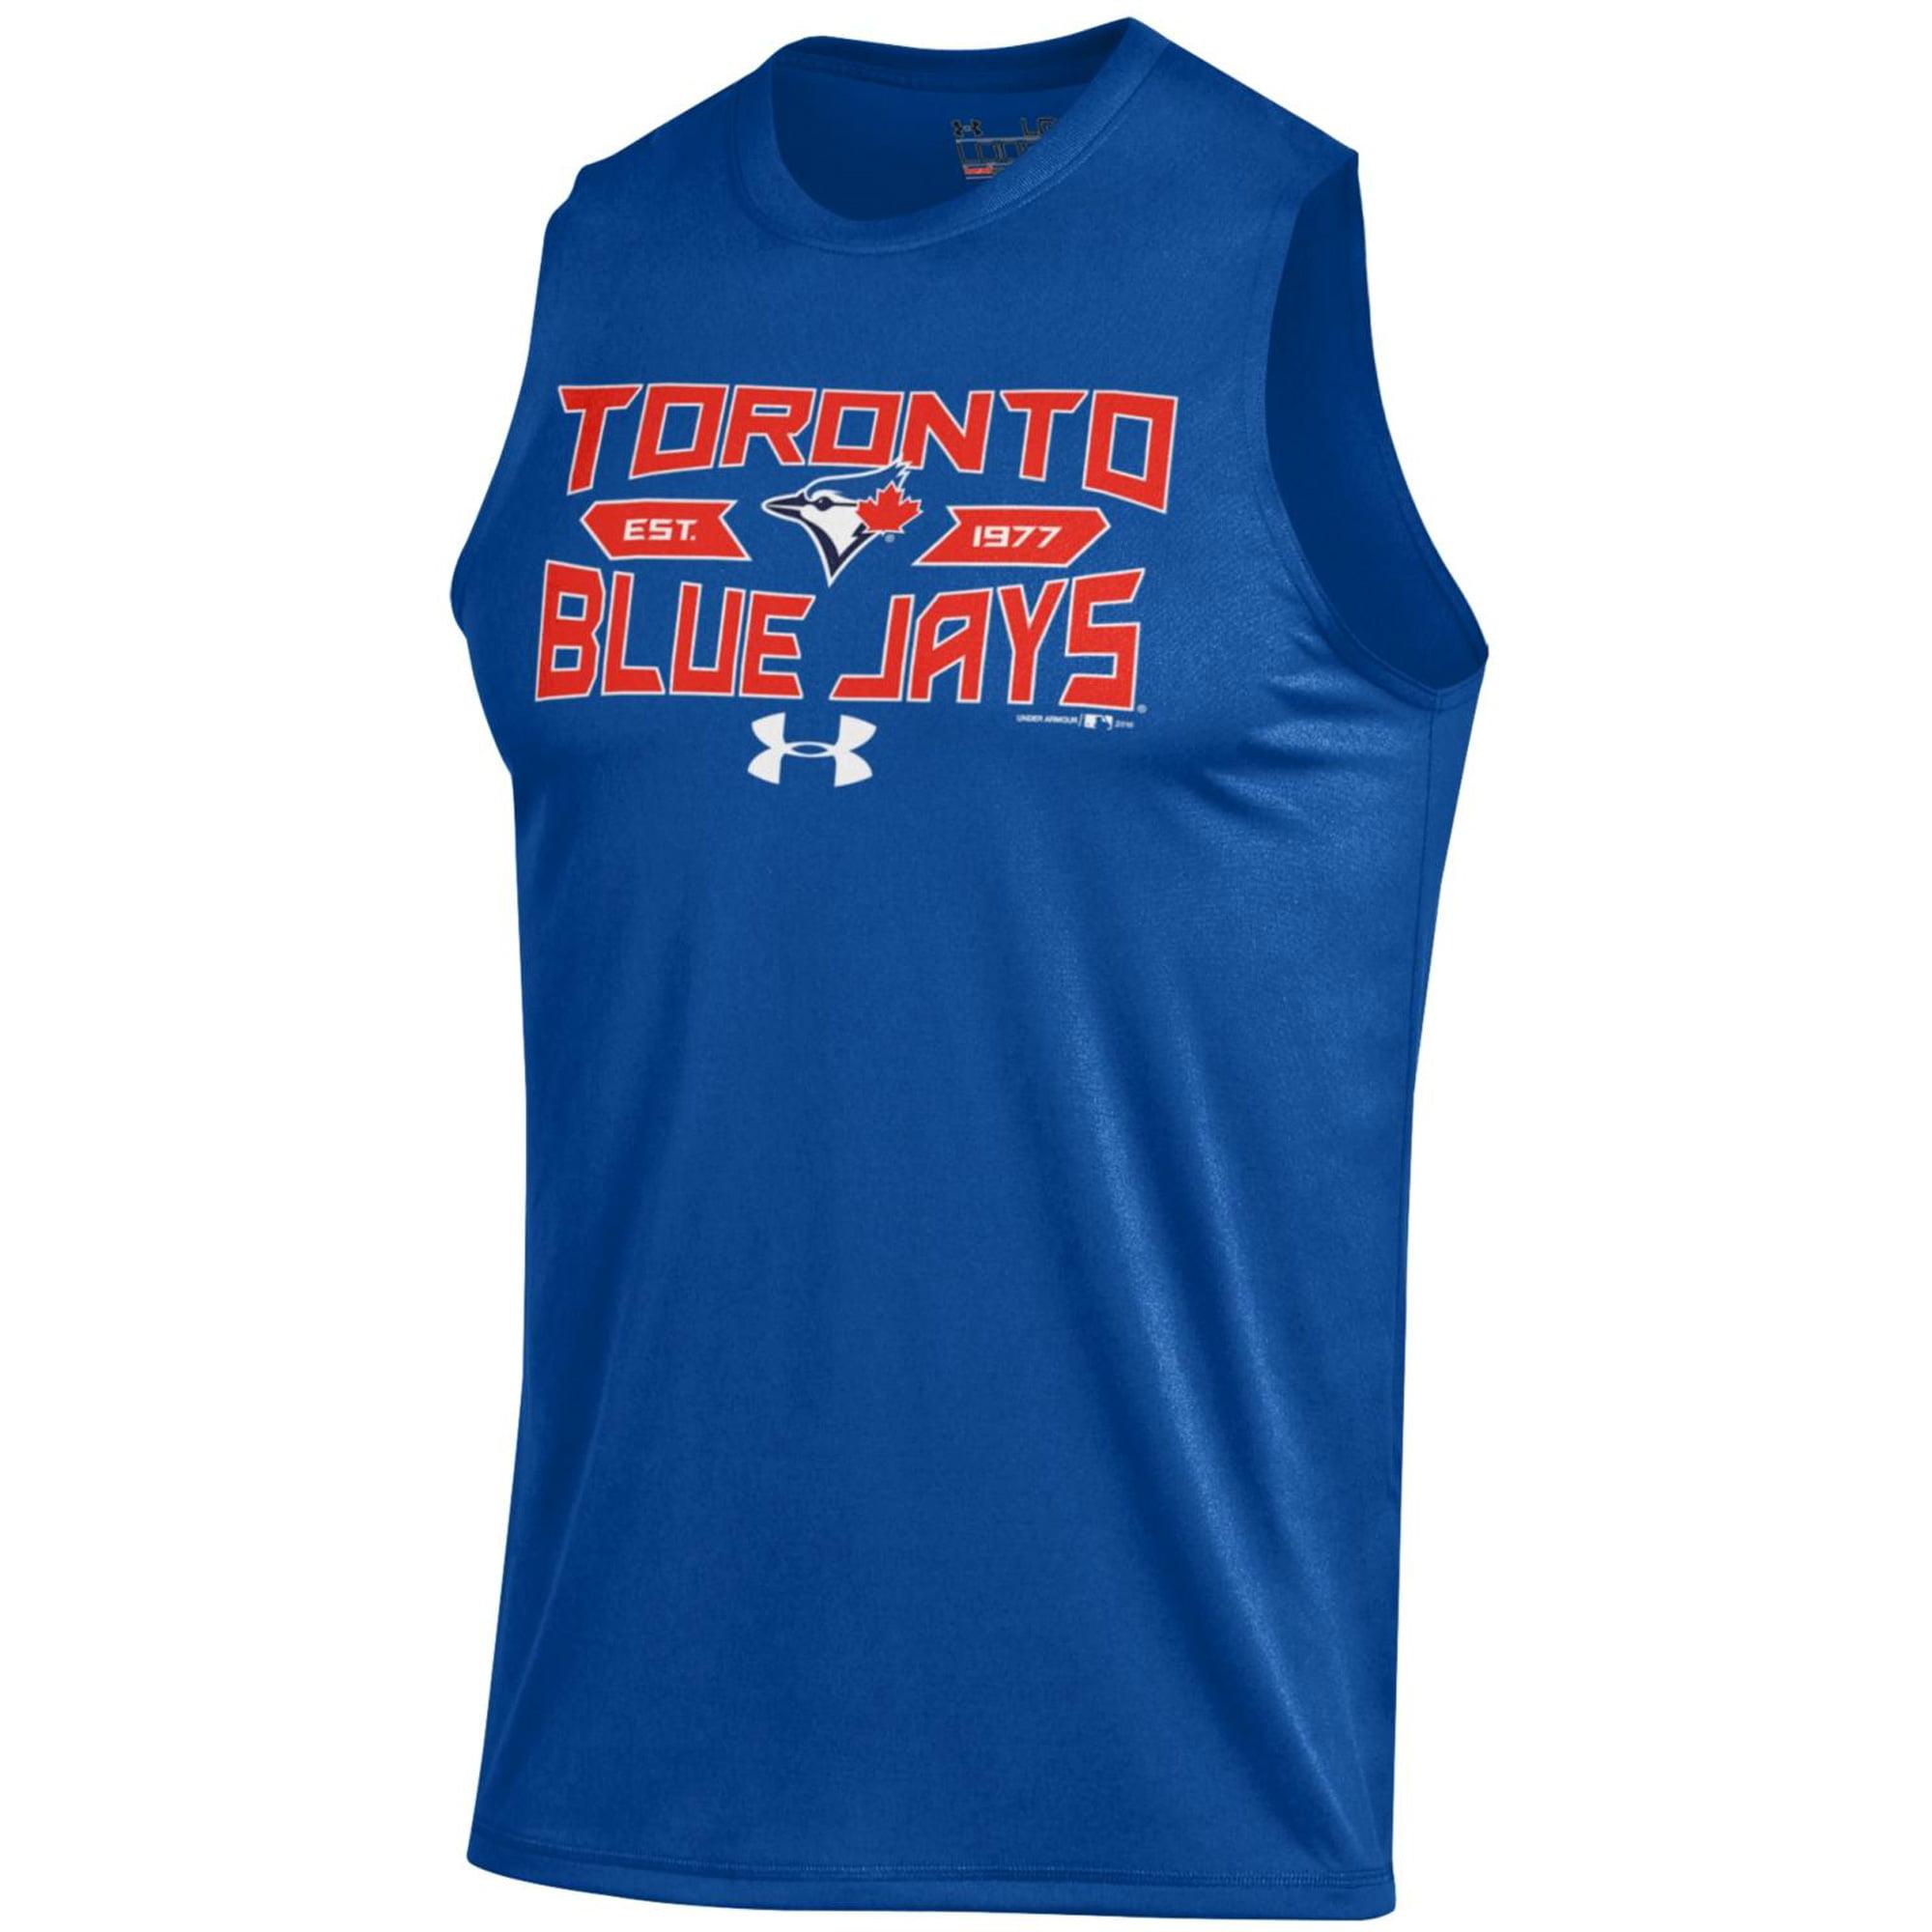 Toronto Blue Jays Under Armour Tech Performance Sleeveless T-Shirt - Royal